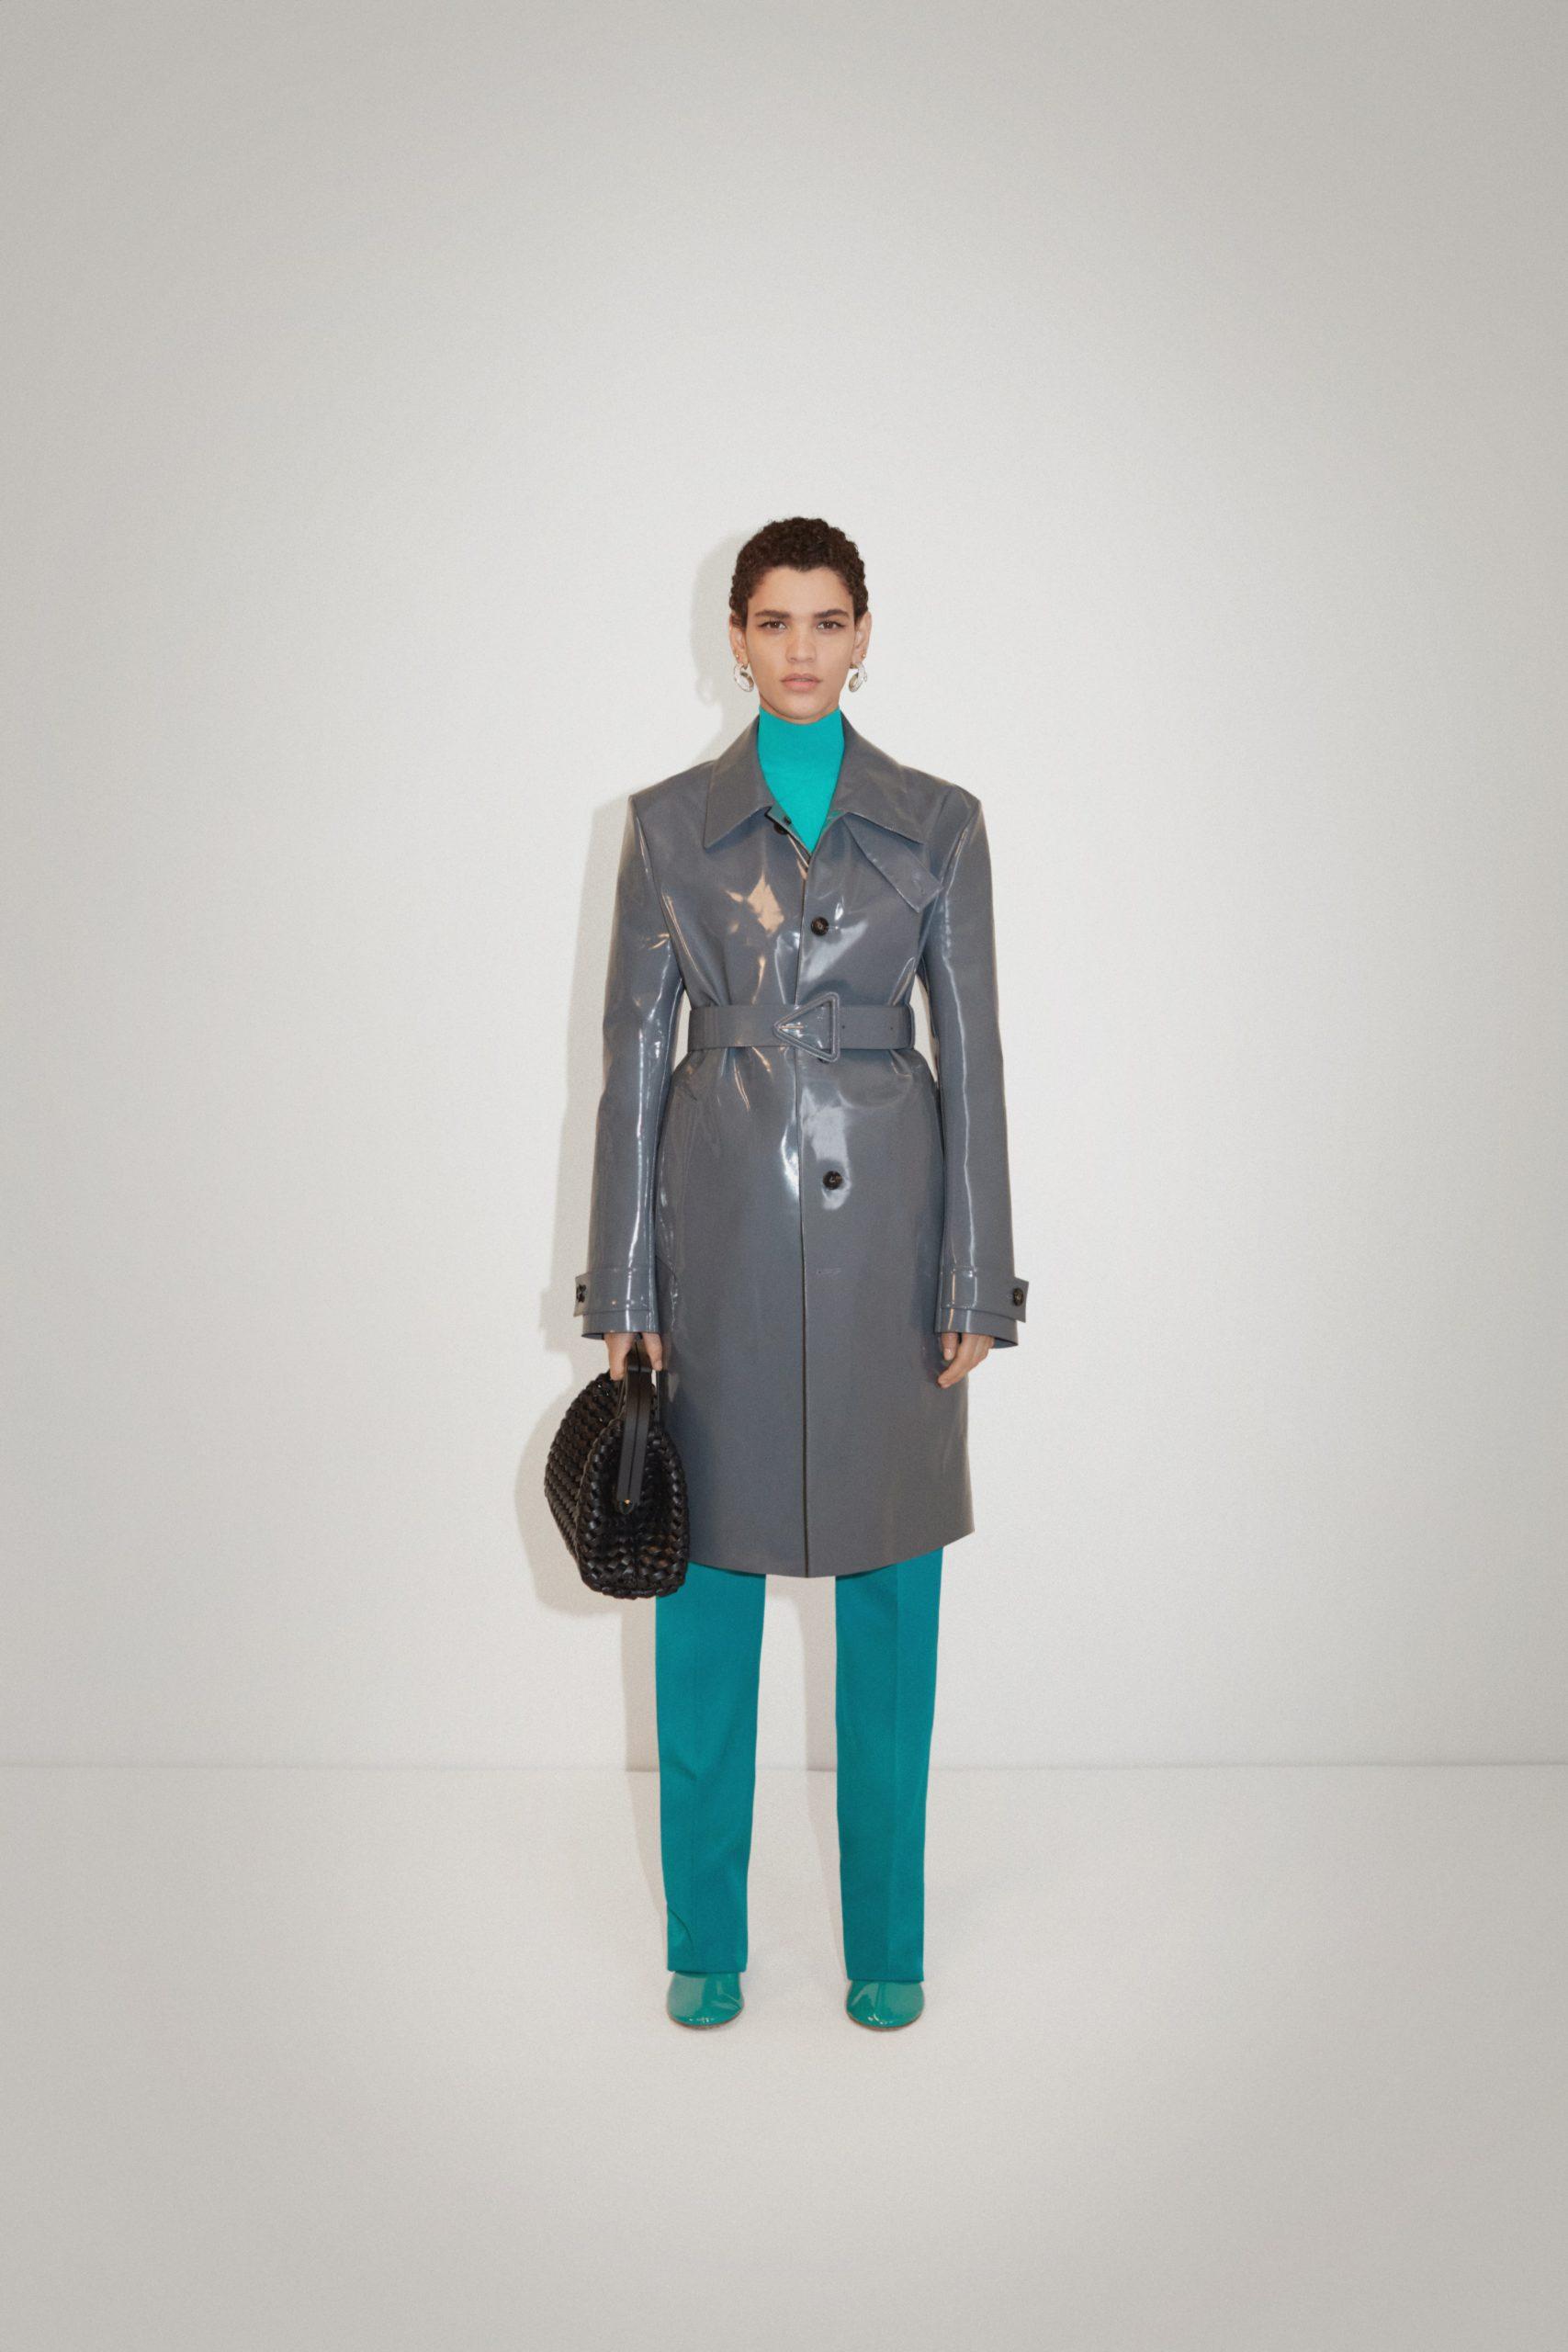 Bottega Veneta 'Wardrobe 02' Resort 2022 Fashion Show Photos